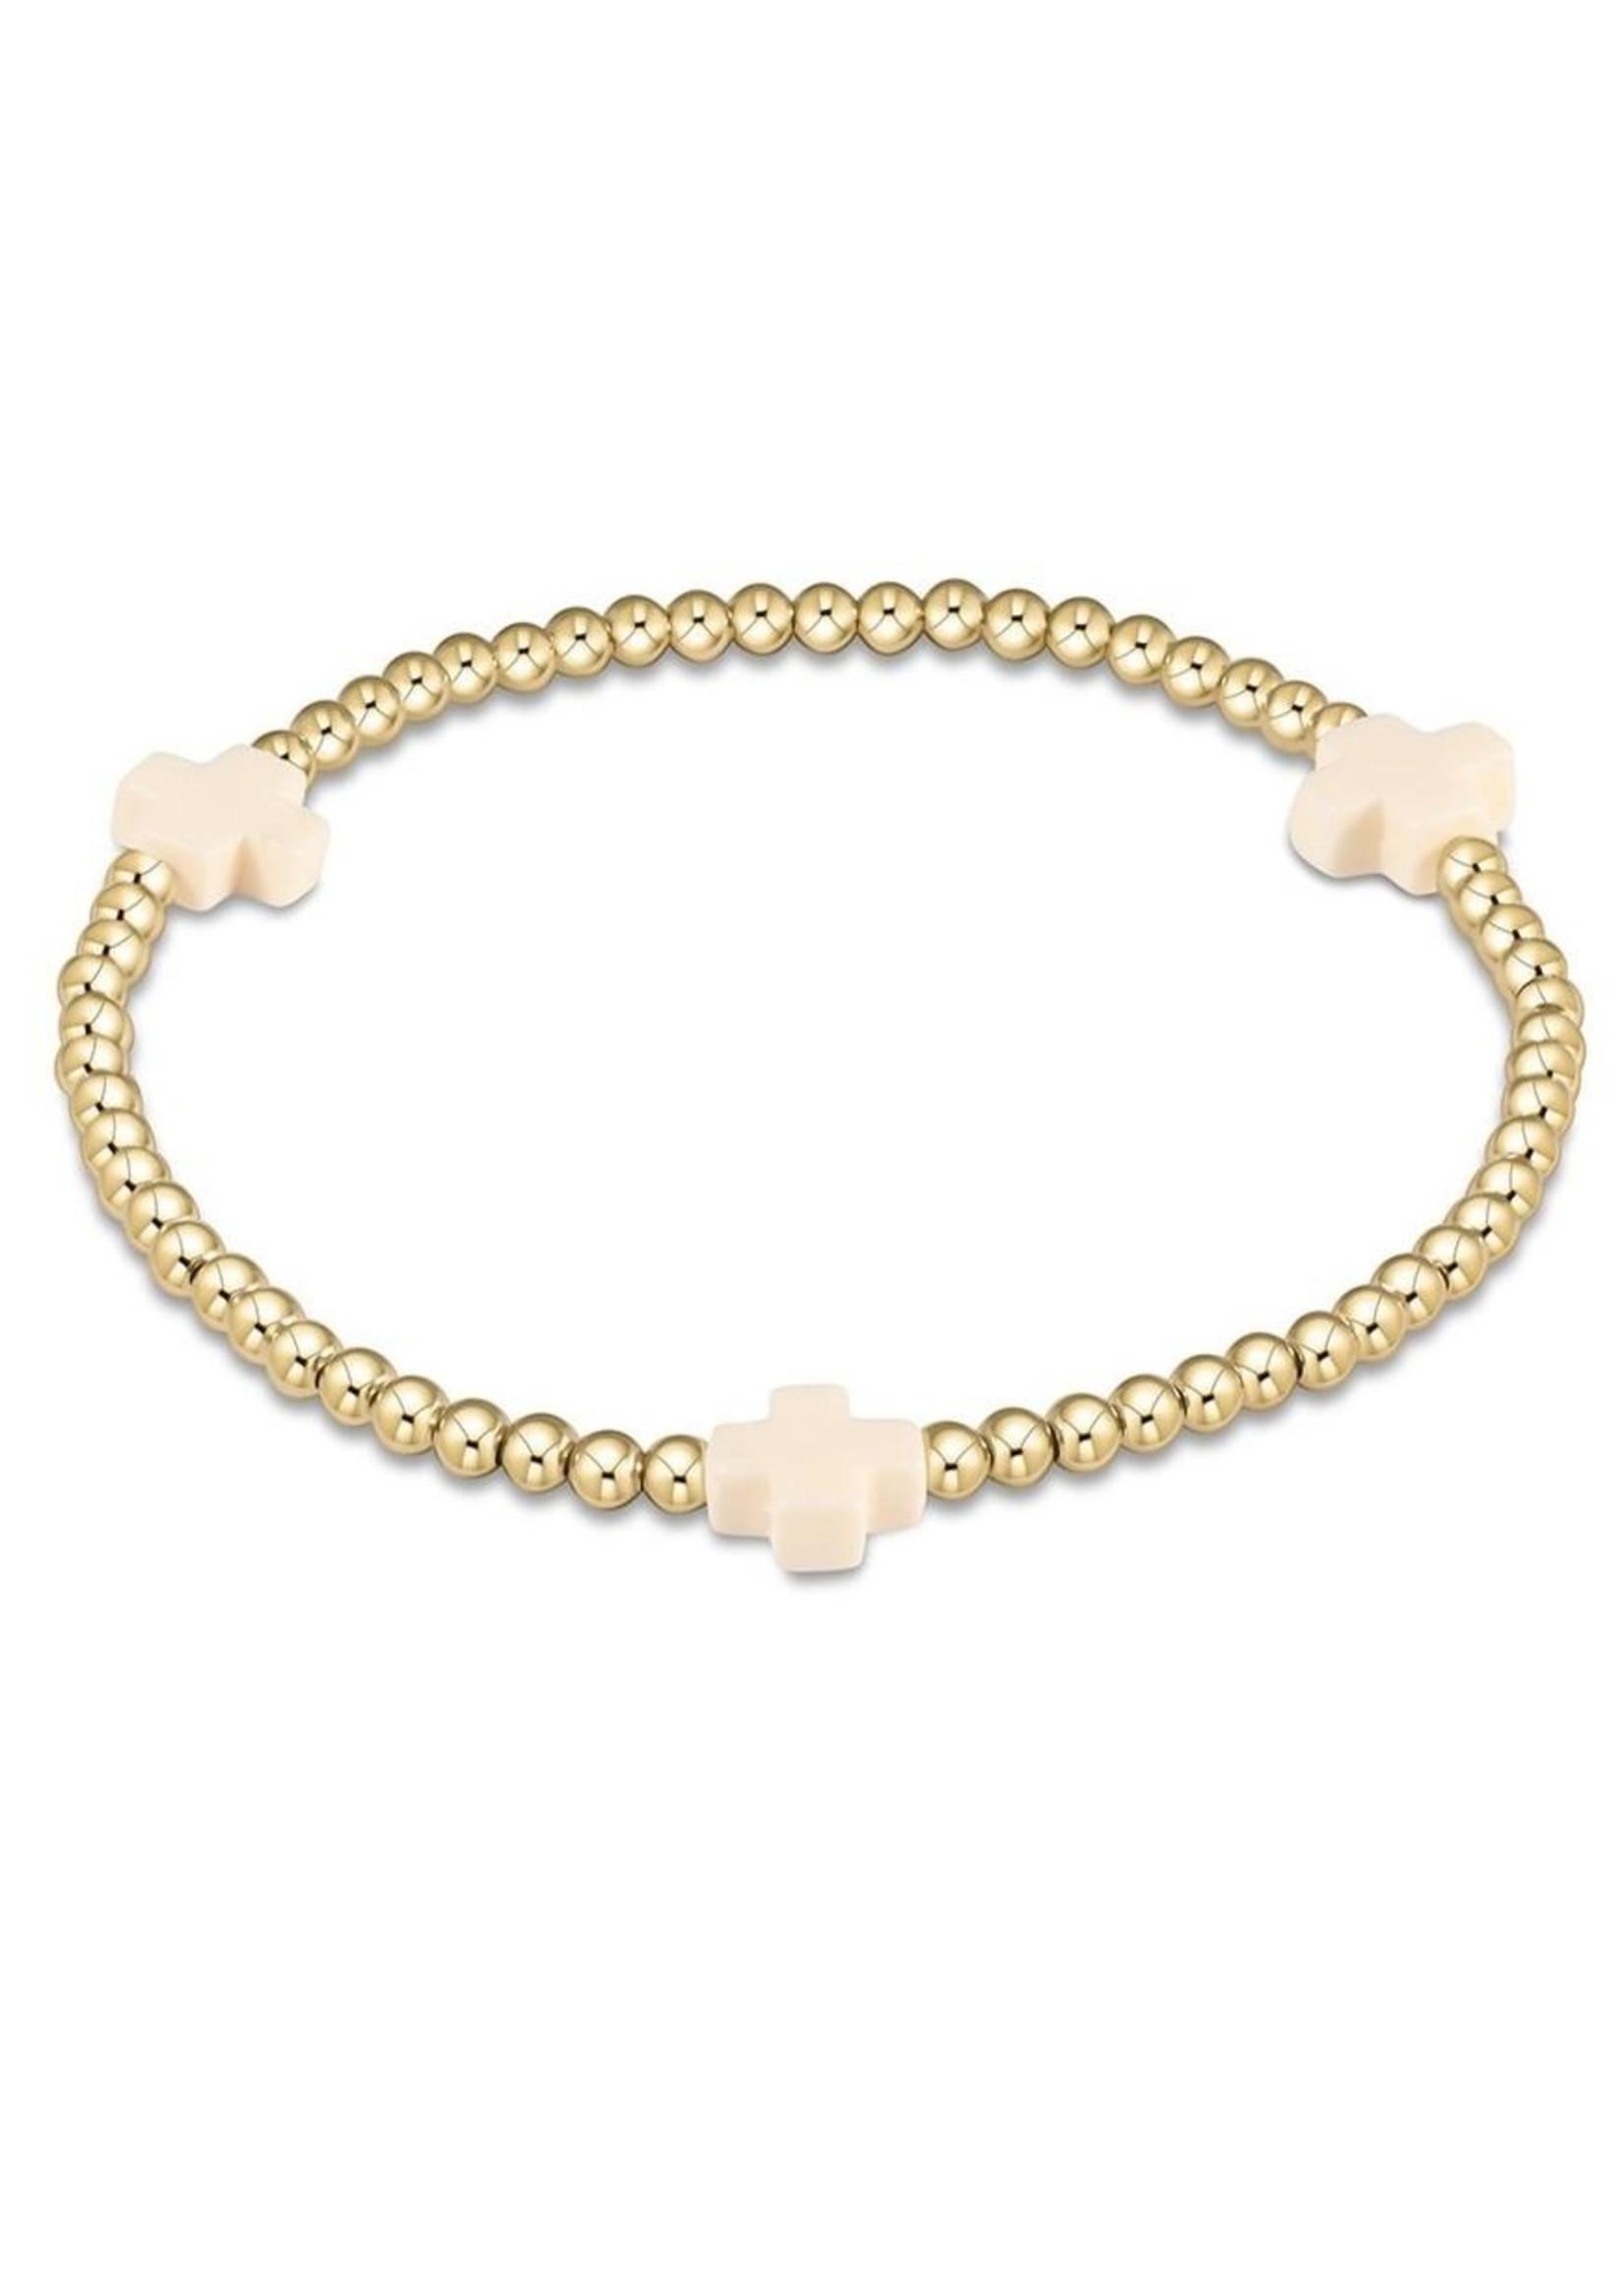 enewton Signature Cross Gold Pattern 3mm Bead Bracelet - Off-White